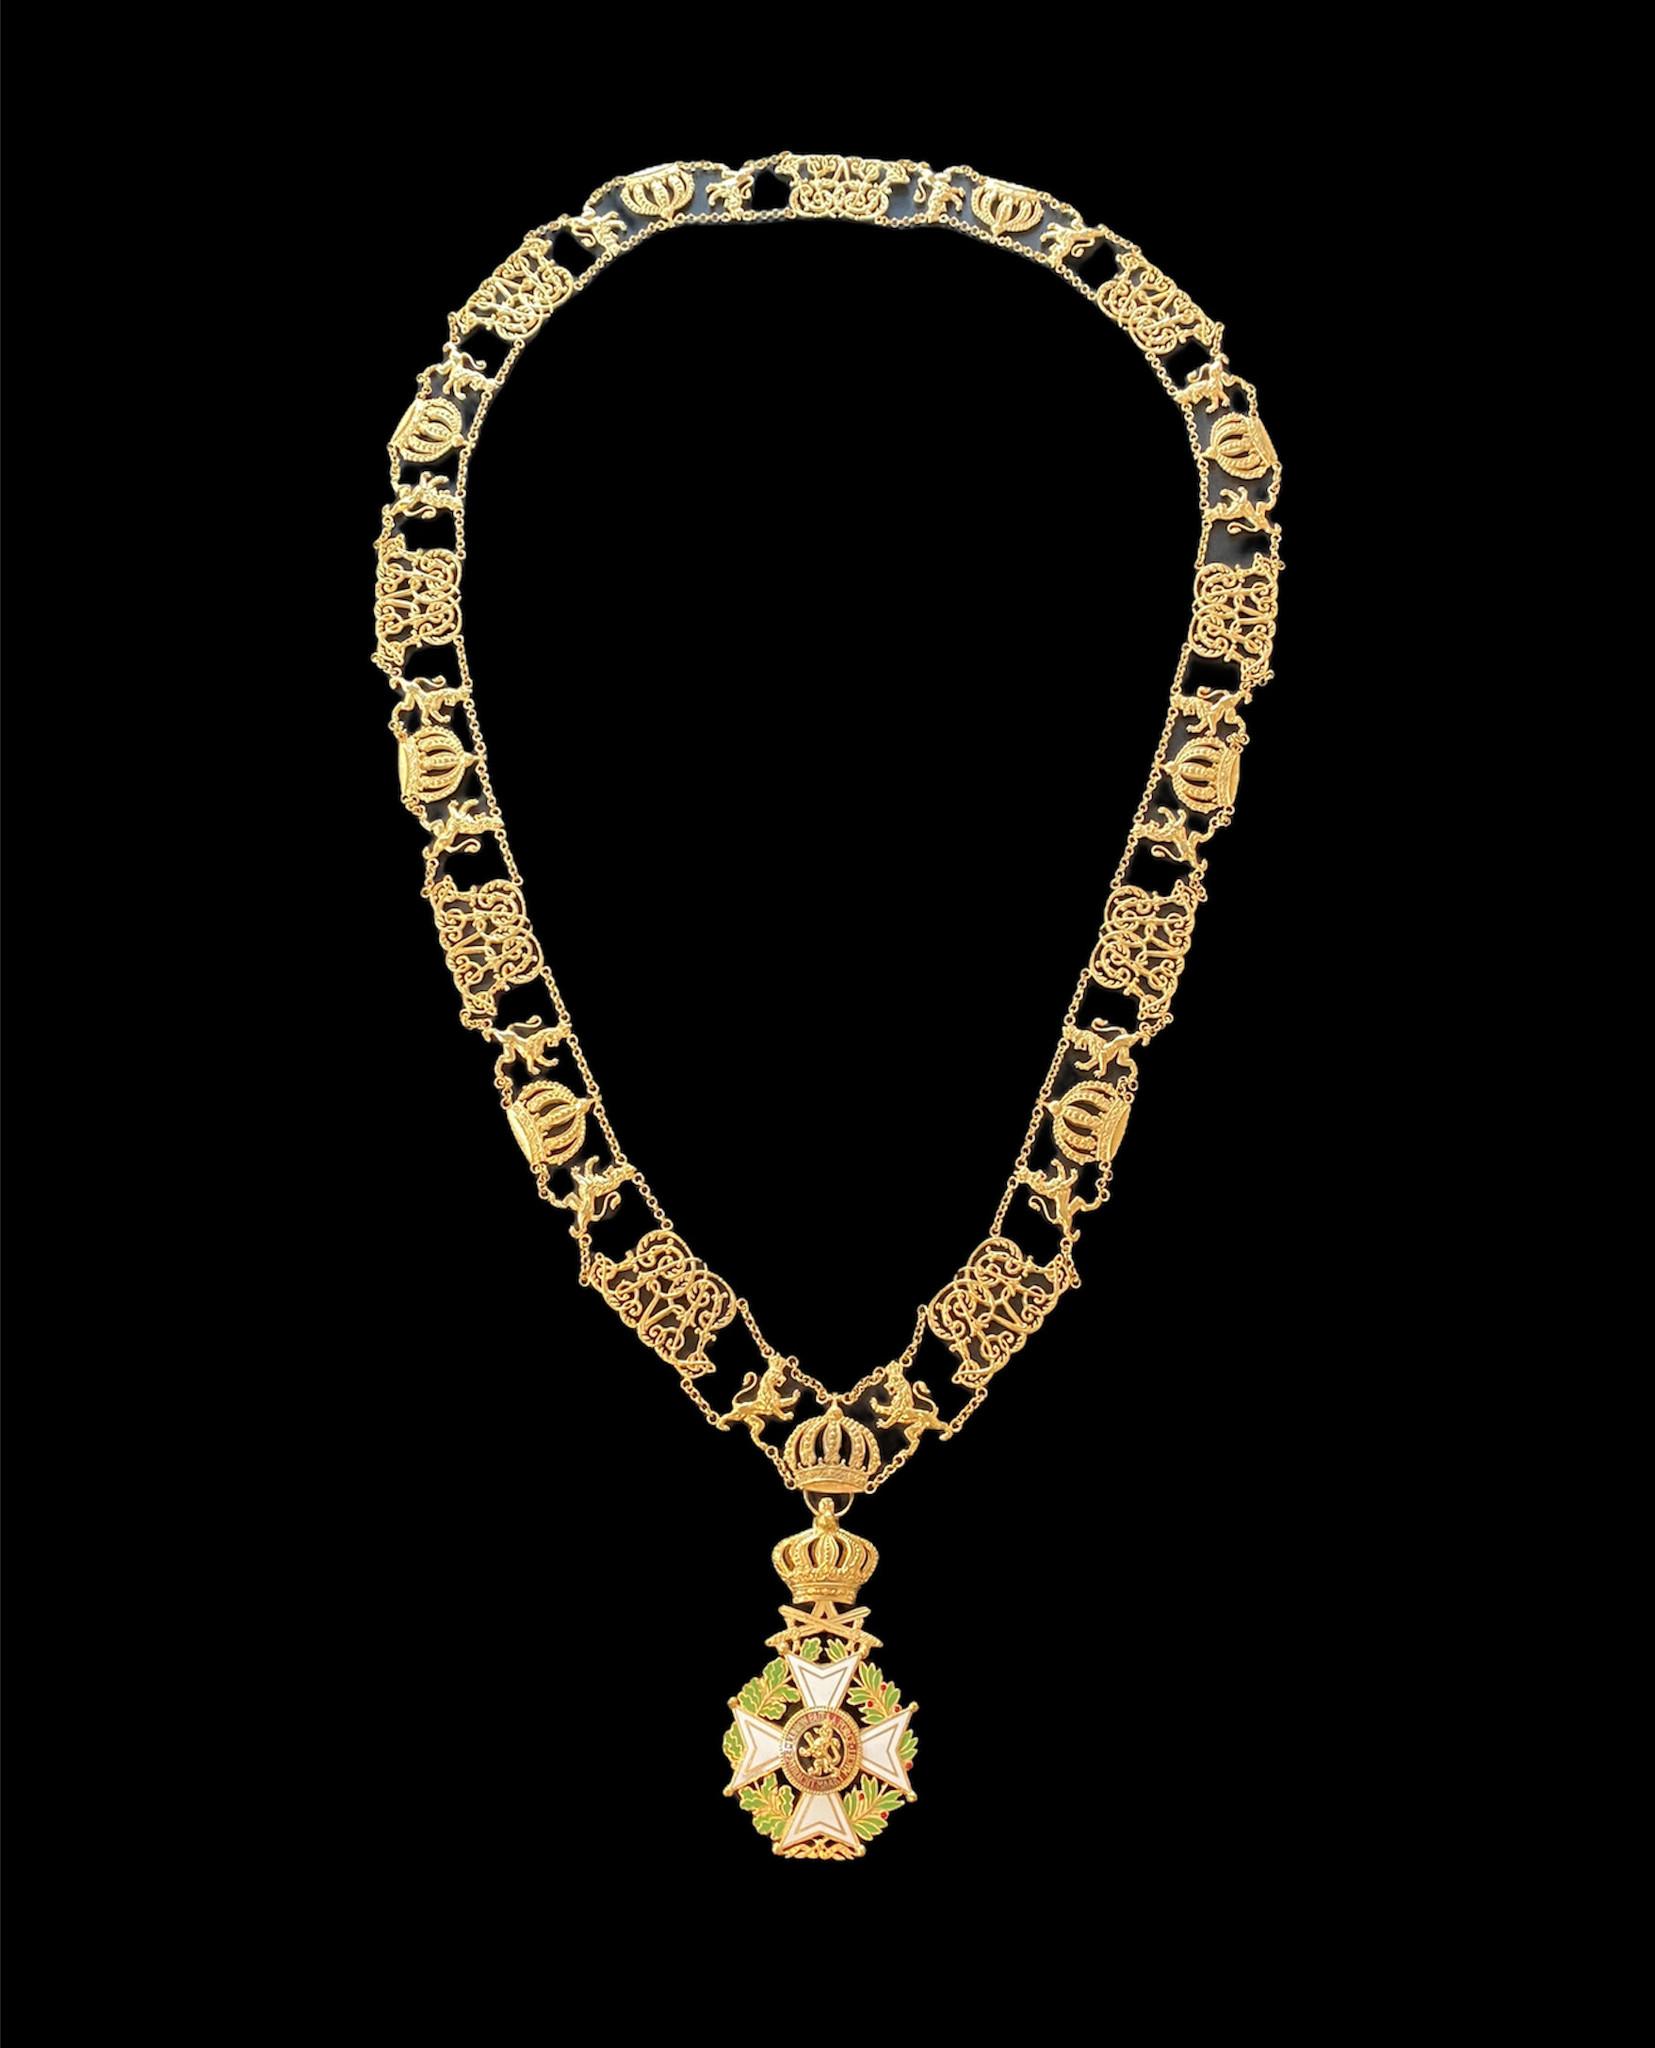 Collar Order of Leopold Civil in silver .925